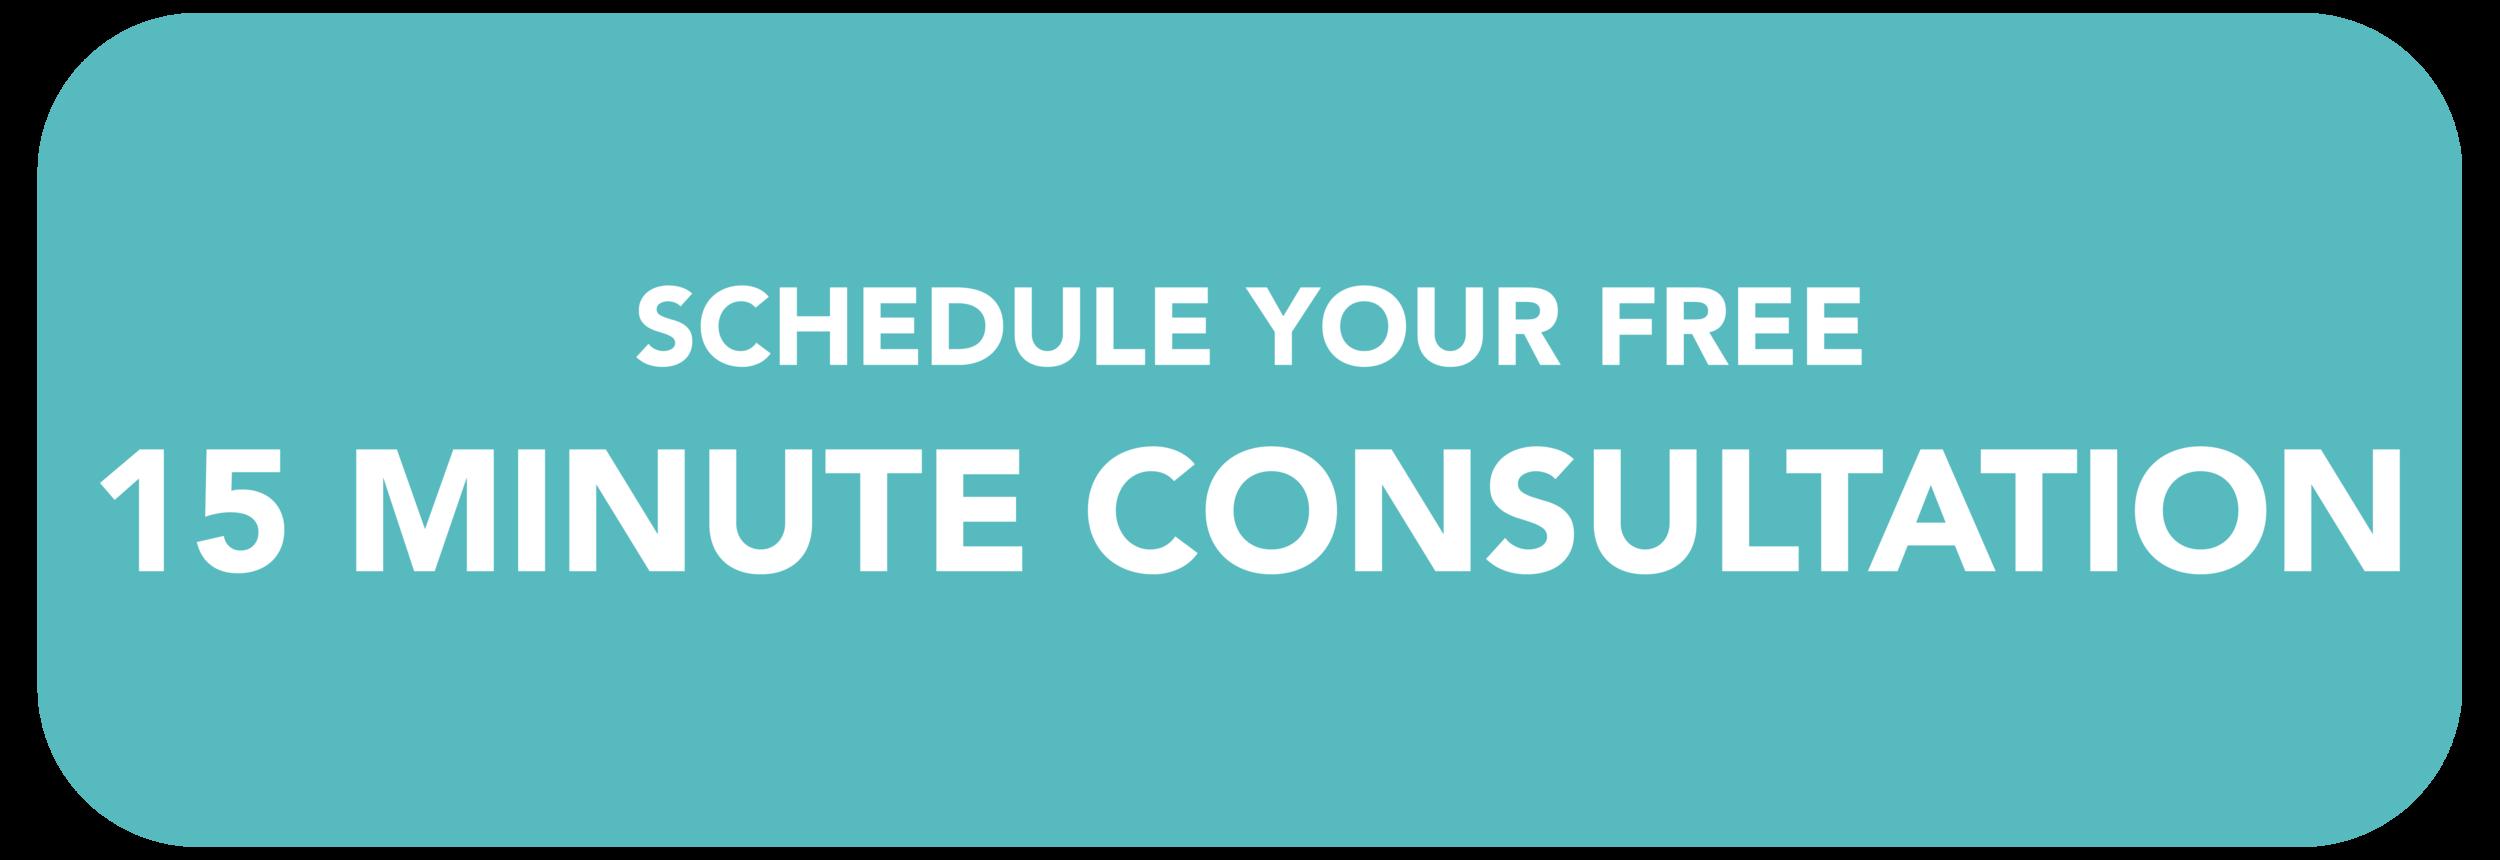 Schedule A Free 15 Minute Consultation